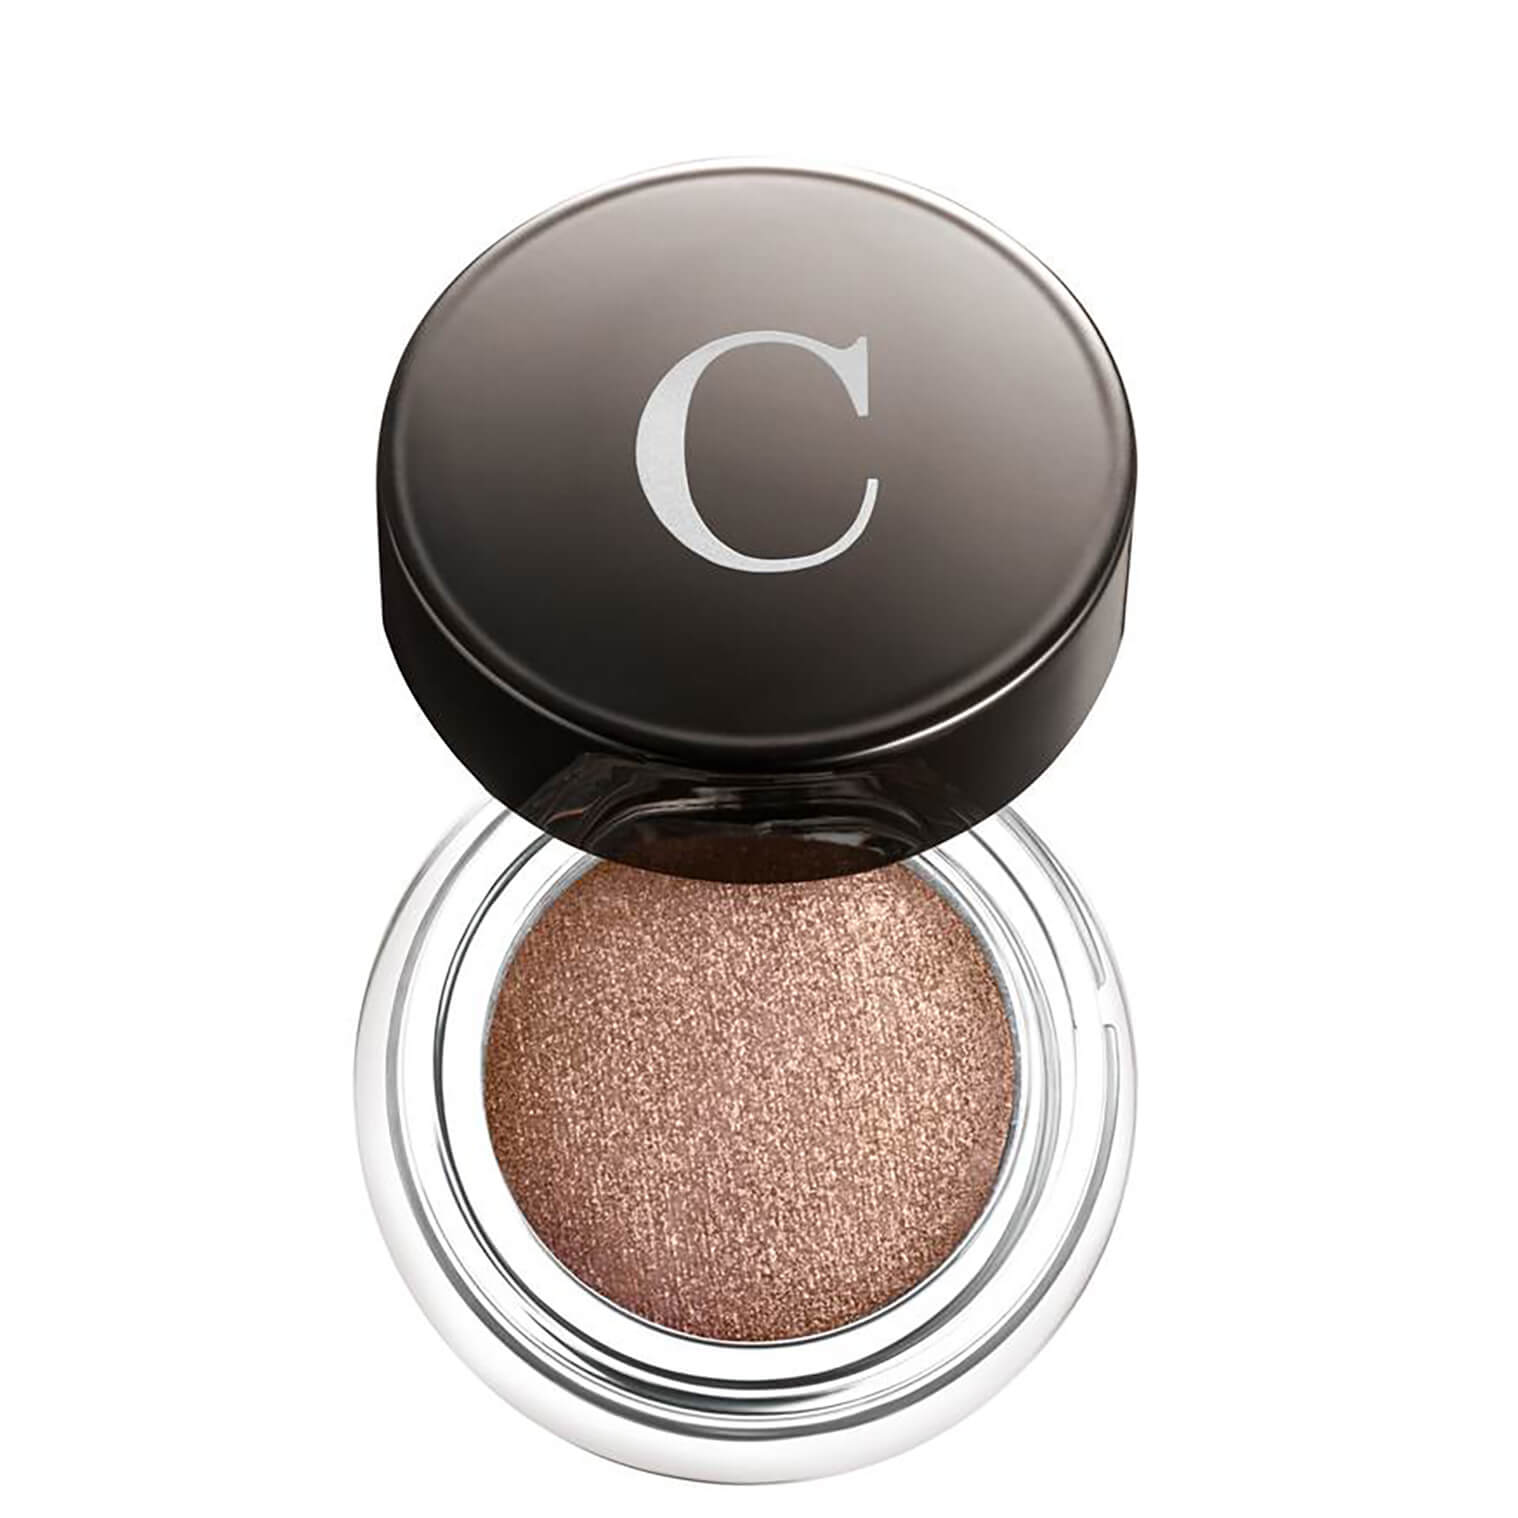 Купить Chantecaille Mermaid Eye Shadow Тени для век - Copper